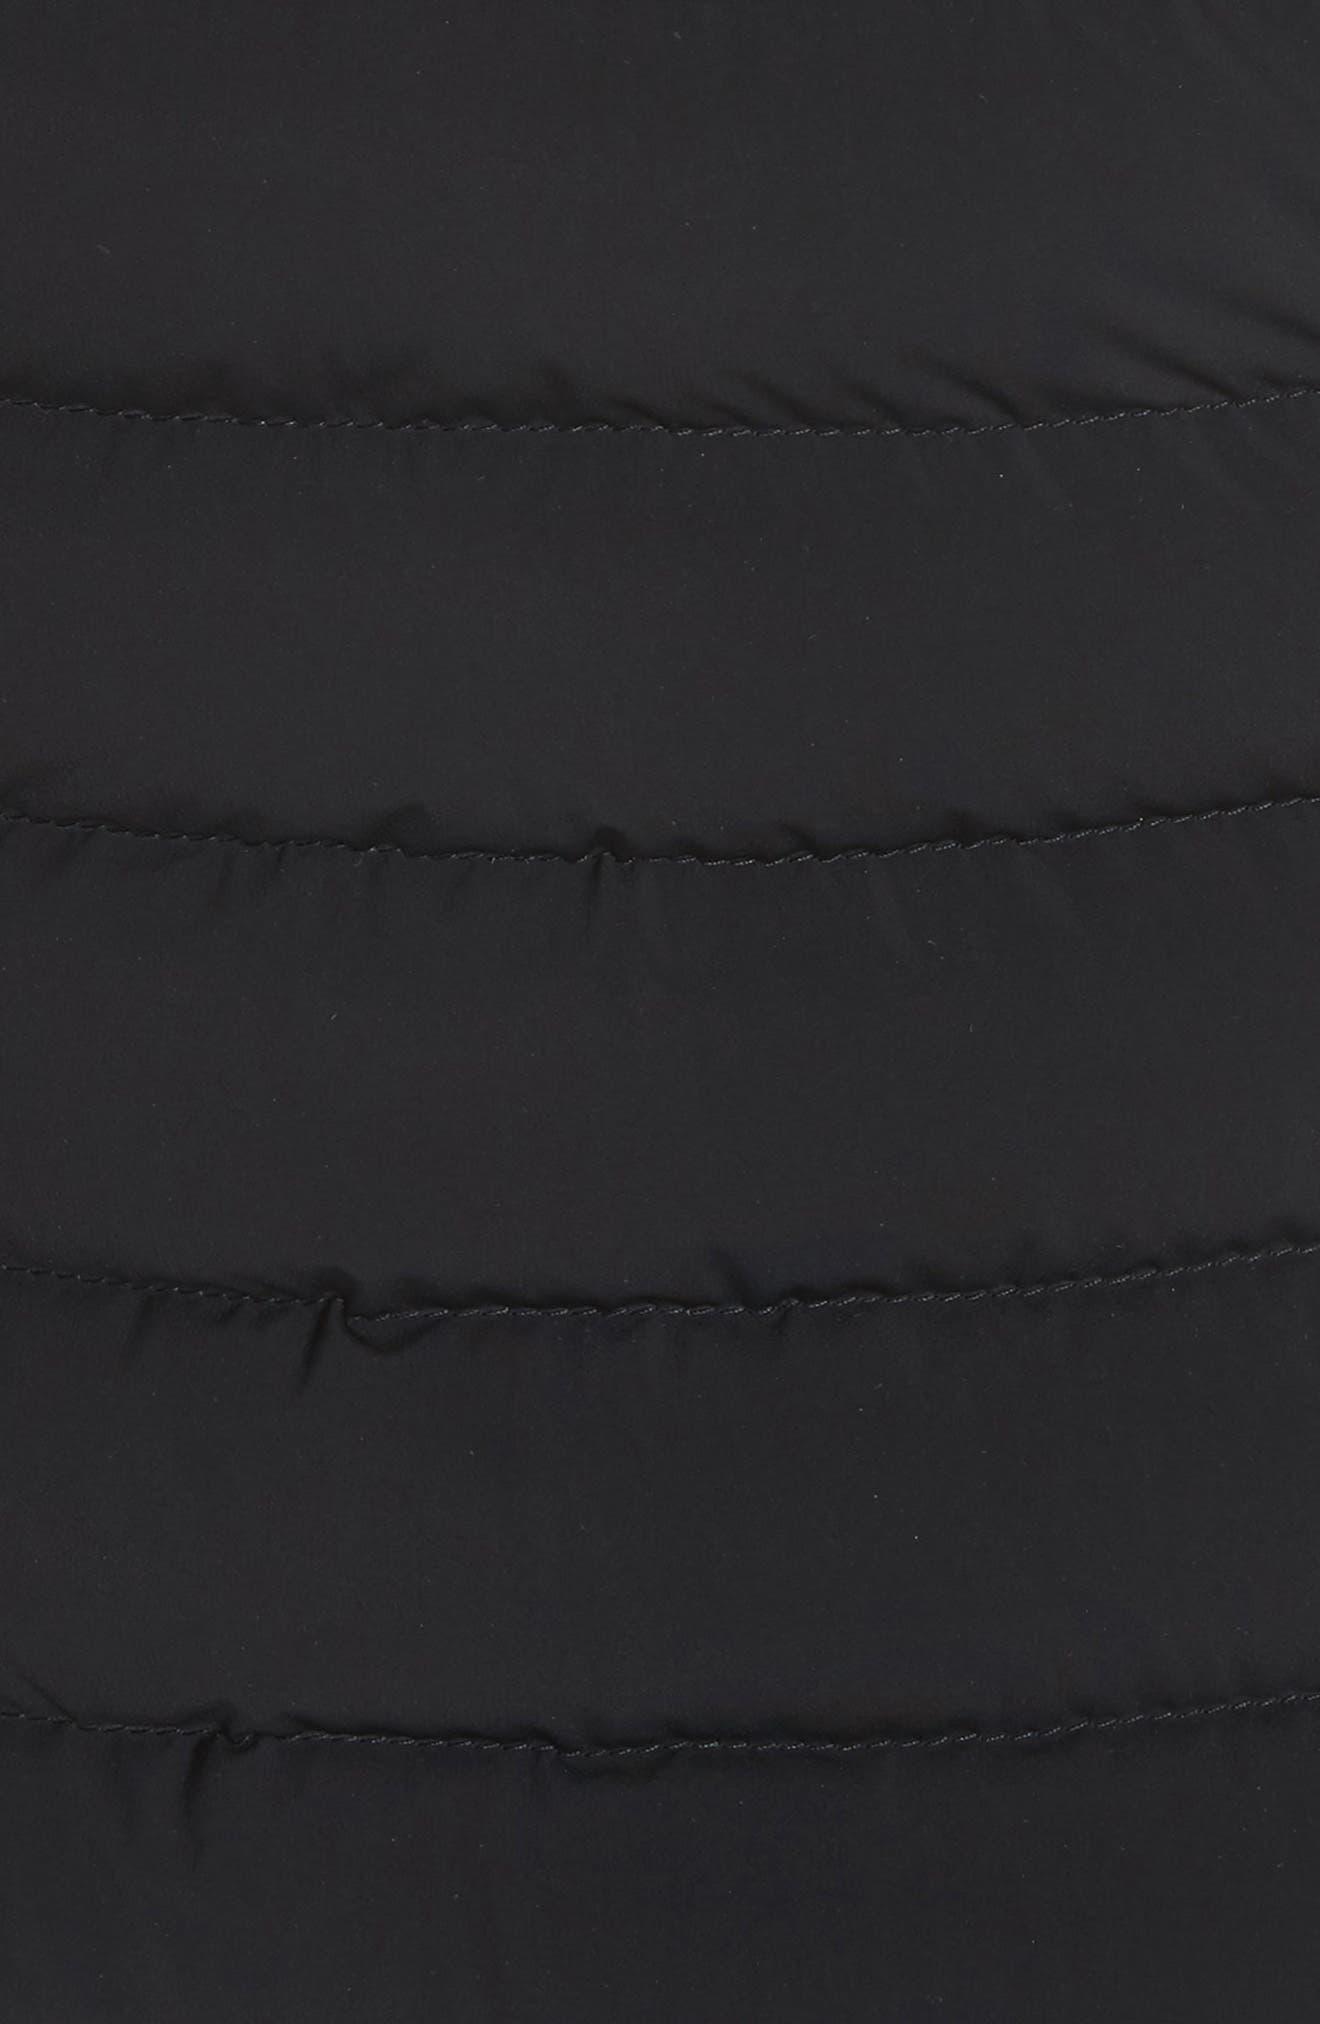 MONCLER, Guillemot Quilted Down Jacket, Alternate thumbnail 6, color, BLACK